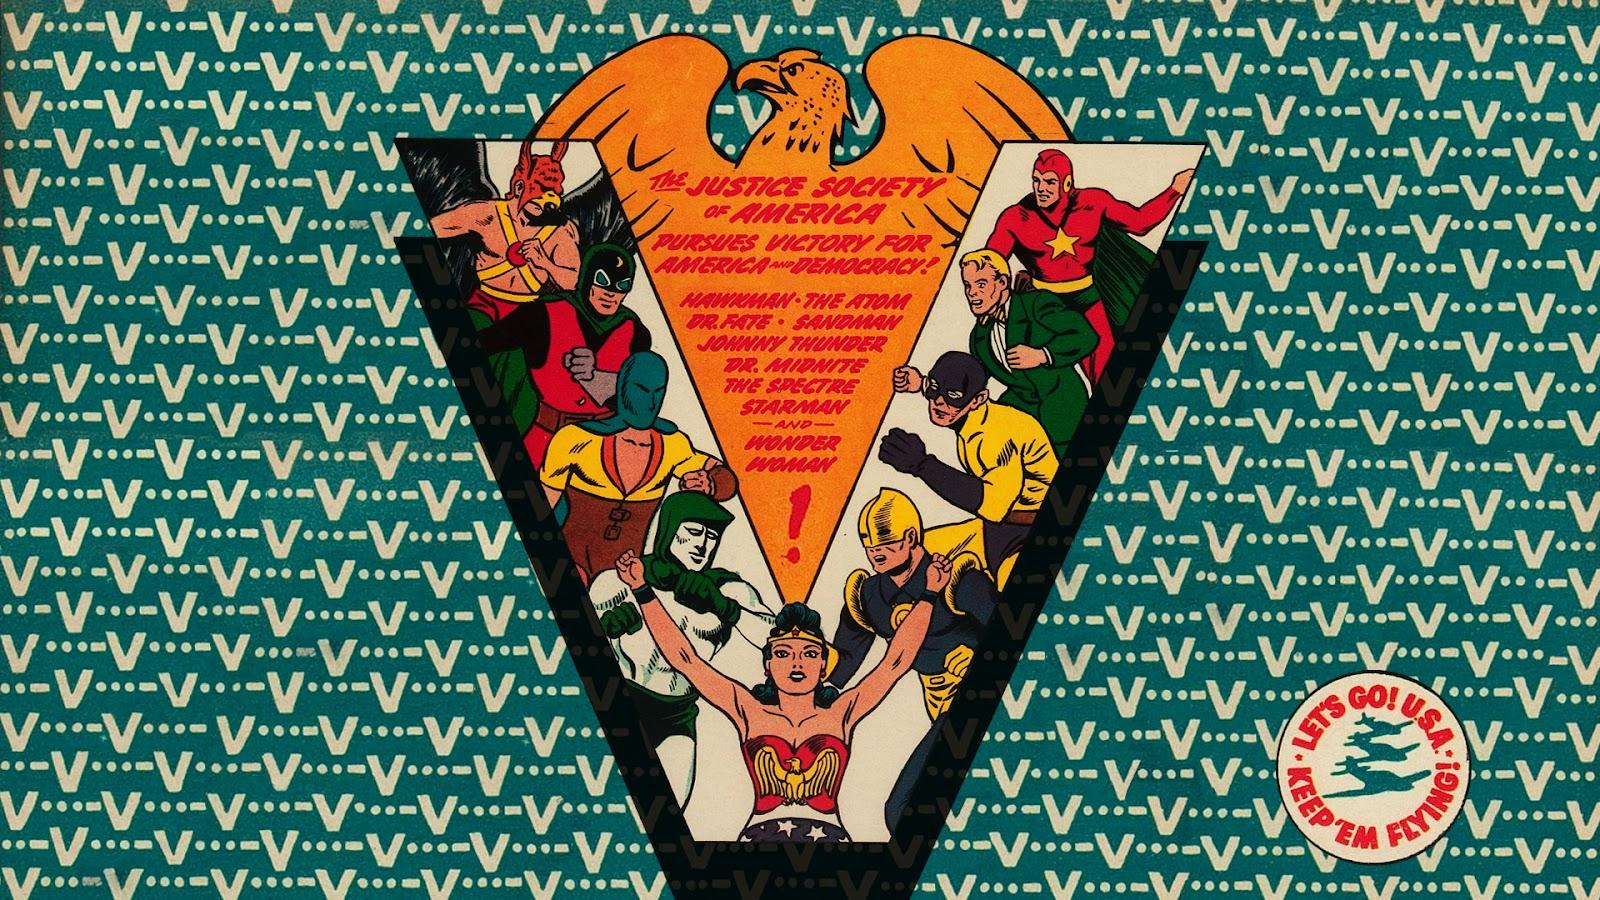 Neato Coolville DESKTOP WALLPAPER COMIC BOOK SUPERHEROES OF THE GOLDEN AGE